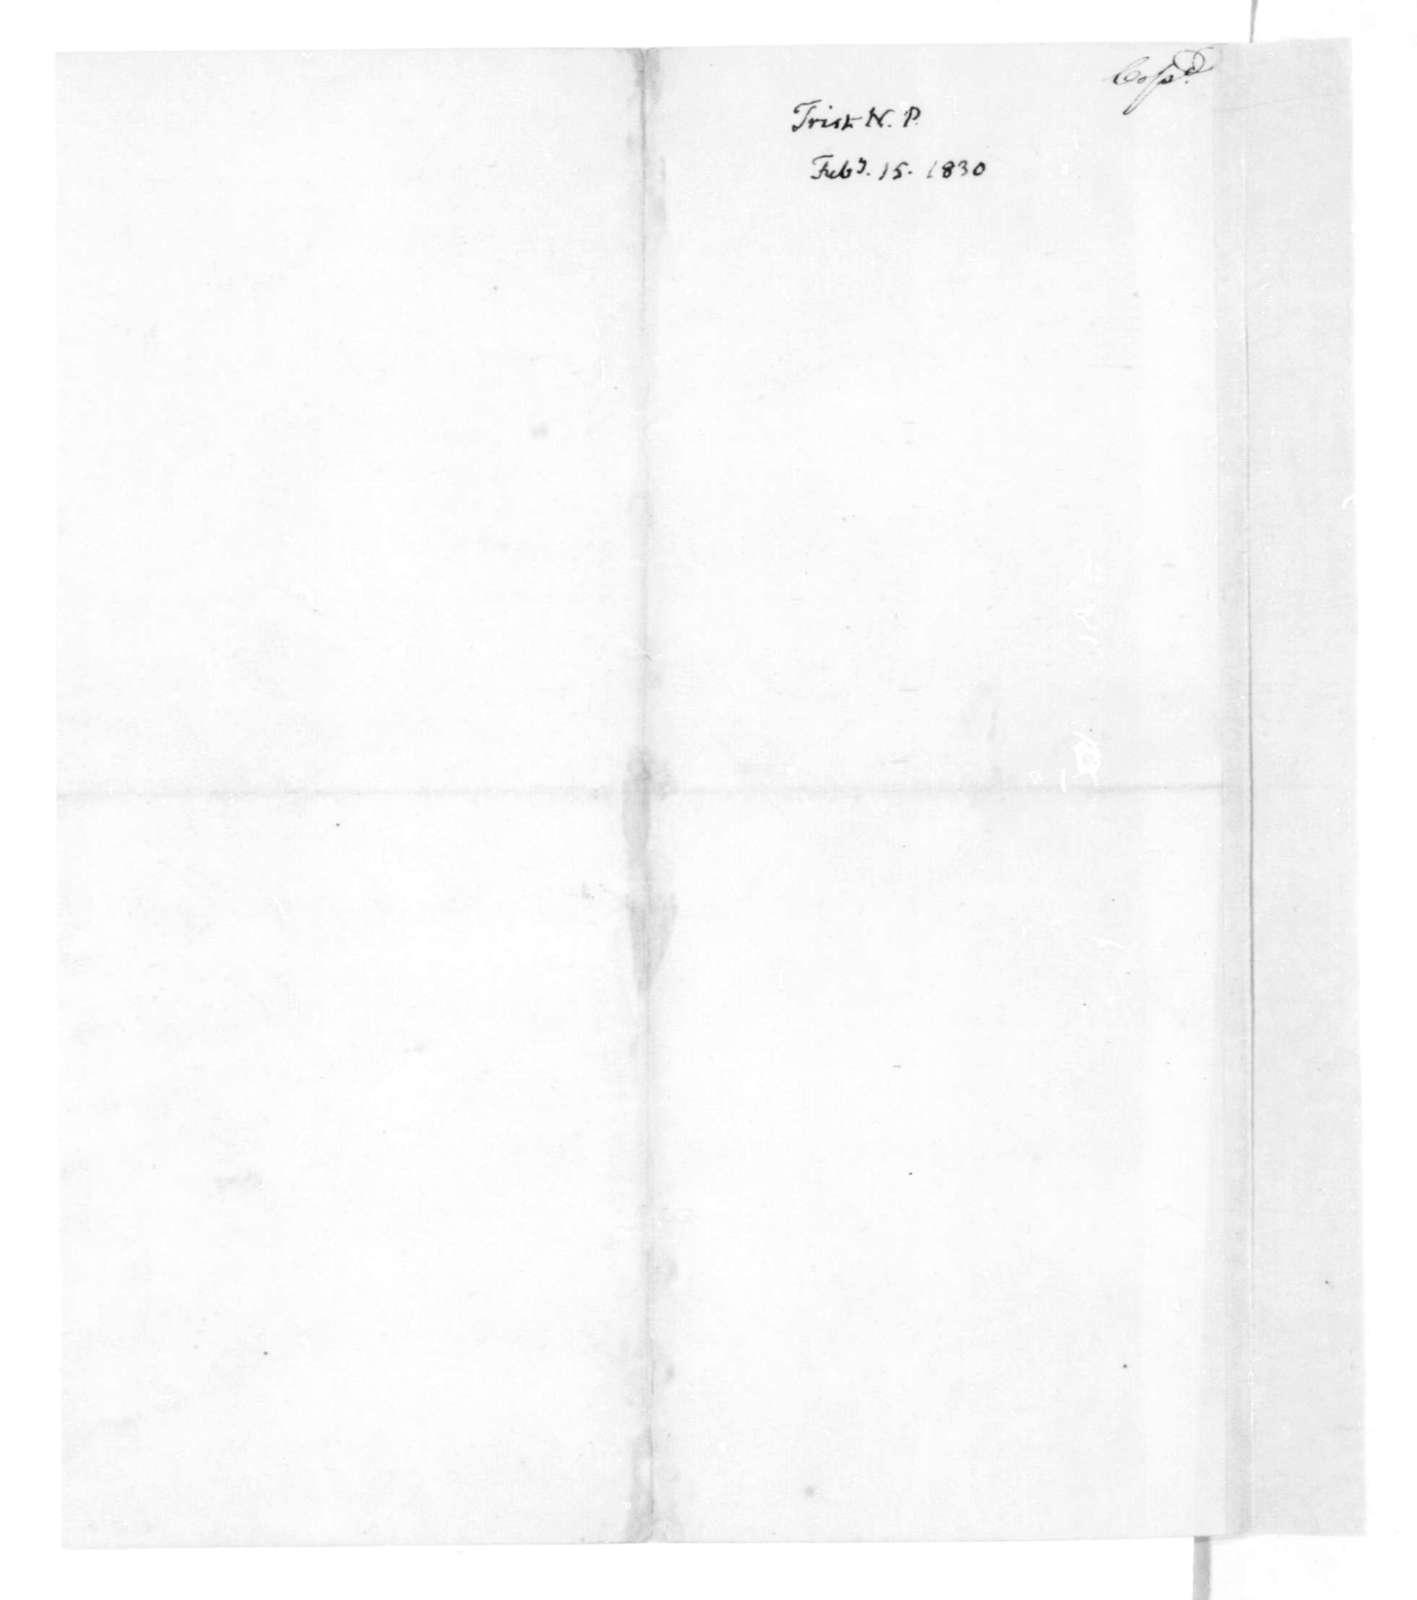 James Madison to Nicholas P. Trist, February 15, 1830.